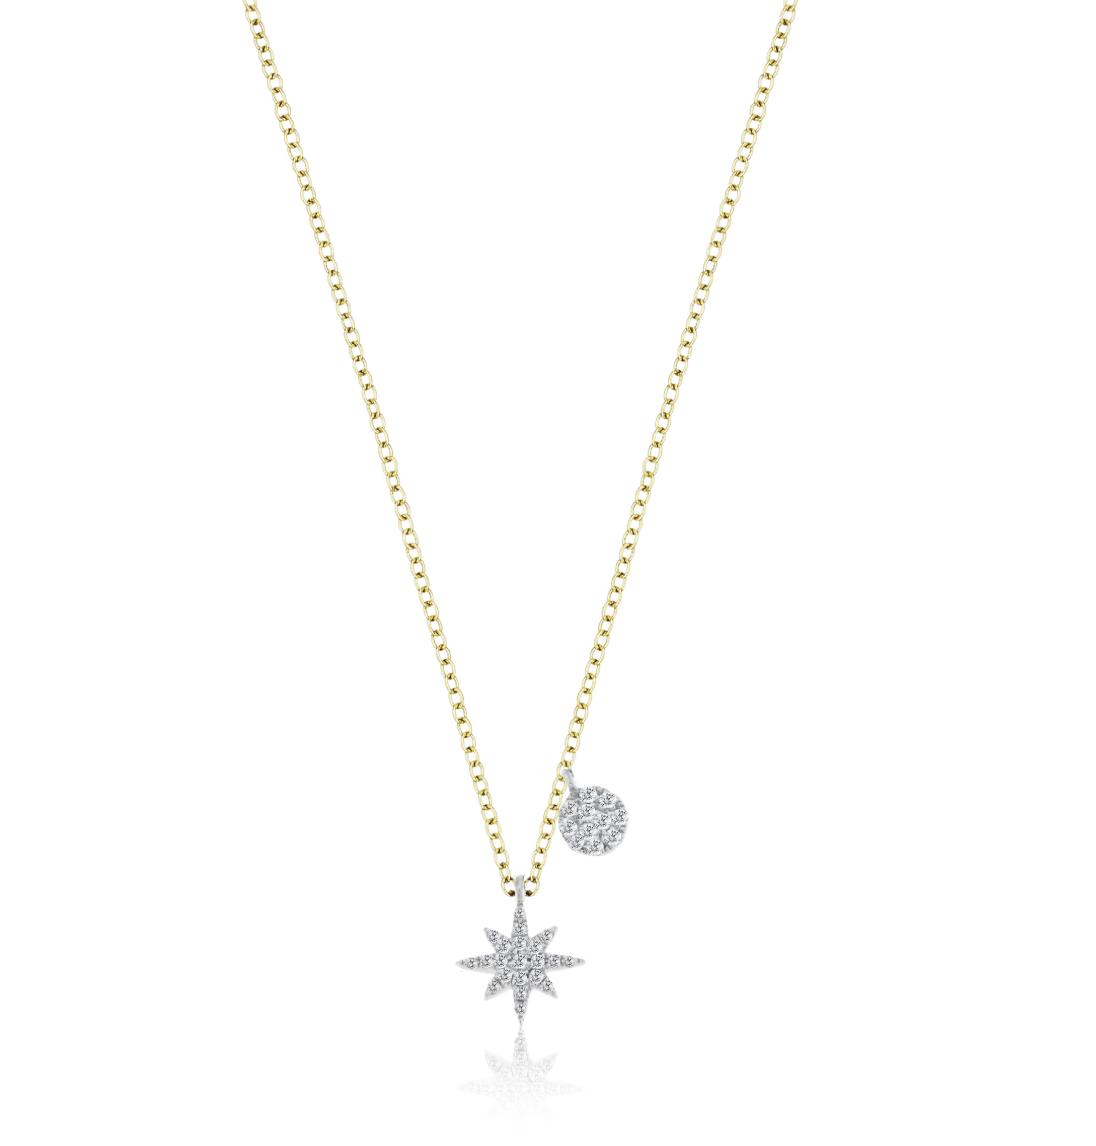 N11967 Starburst Diamond Necklace